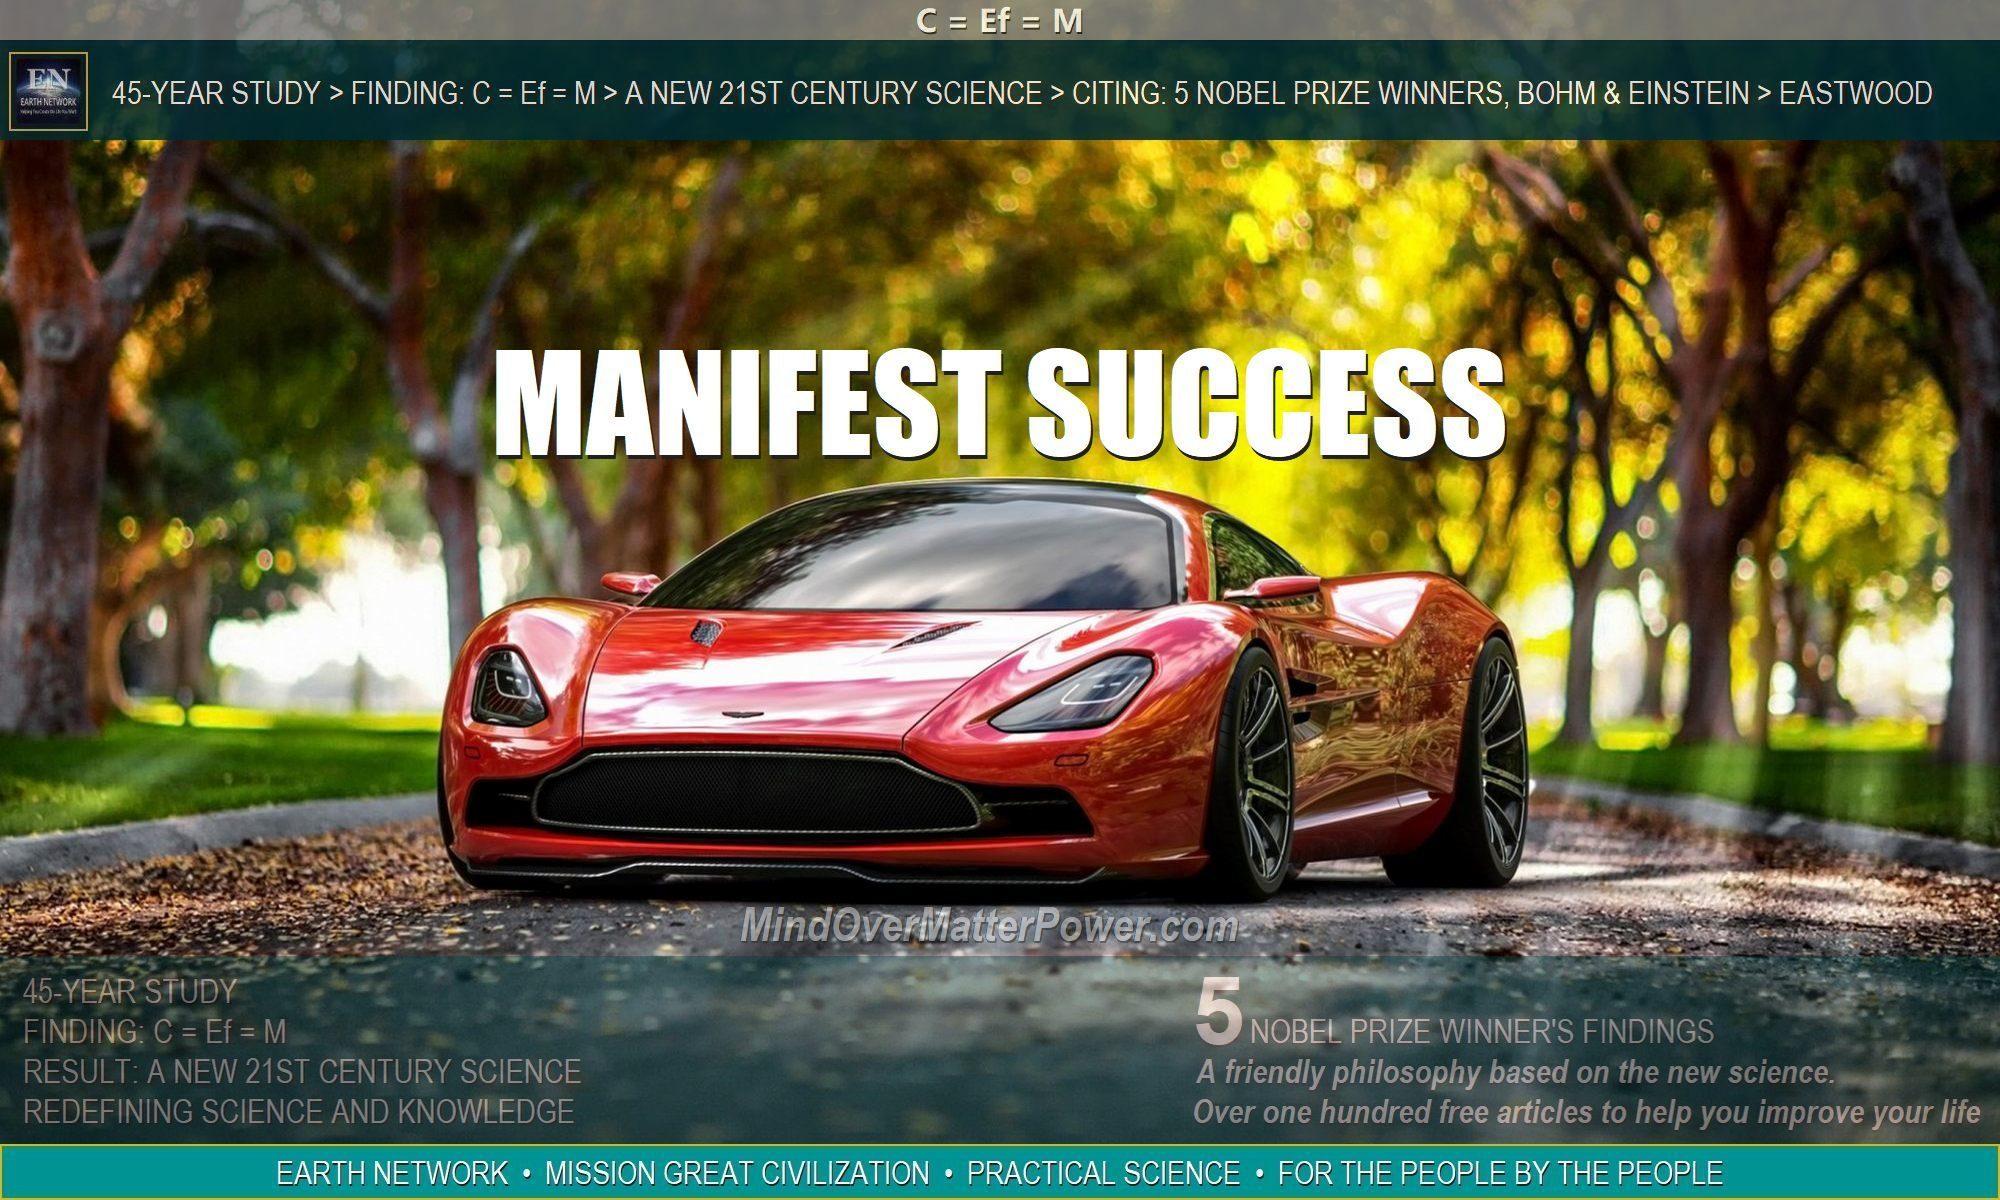 Austin Martin Ferrari depicts success manifesting using principles, imagination, positive desire, willpower, resolve and determination.